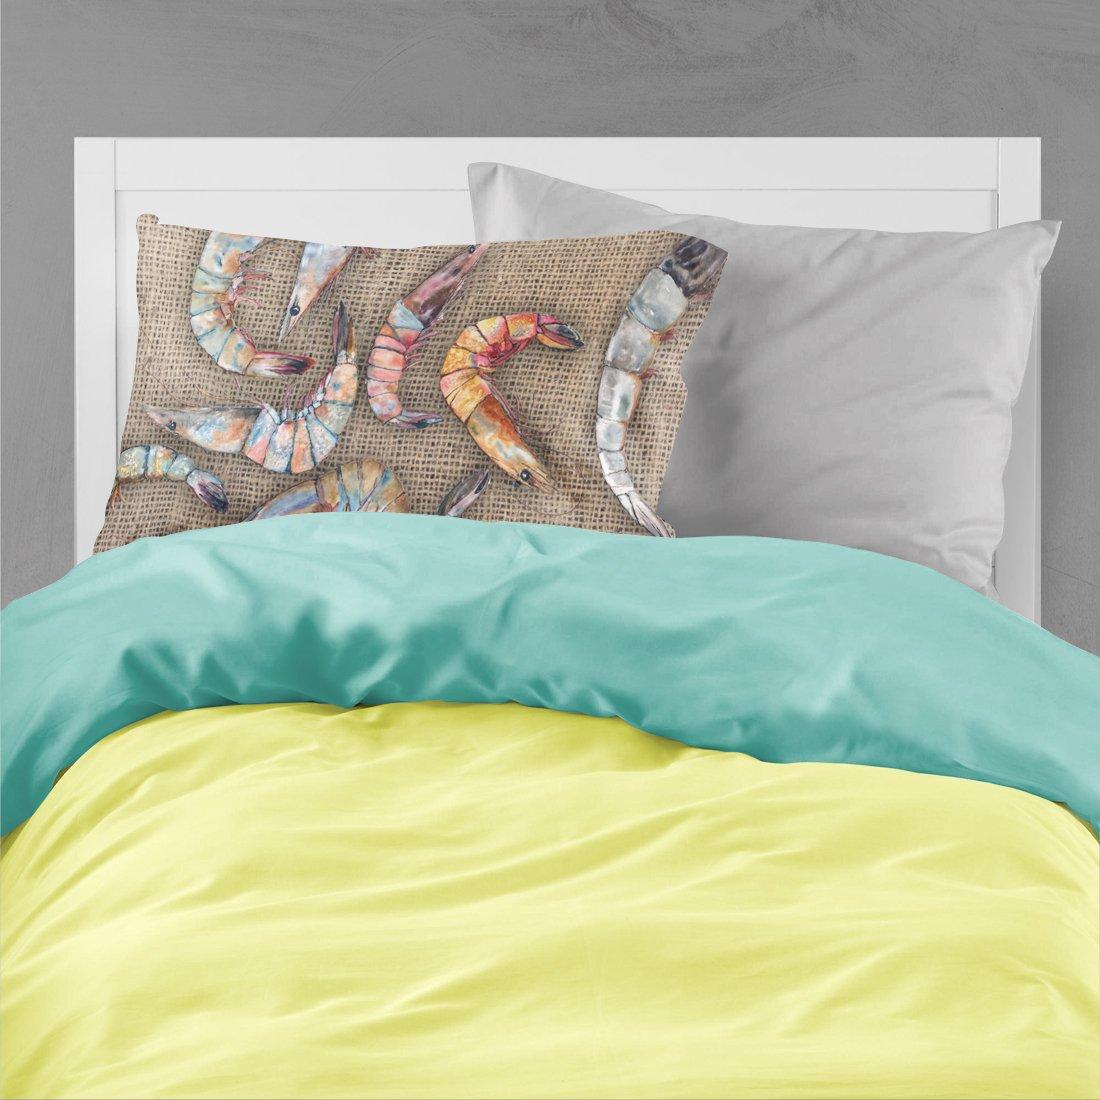 Large Multicolor Carolines Treasures 8738PILLOWCASE Shrimp Moisture Wicking Fabric Standard Pillowcase